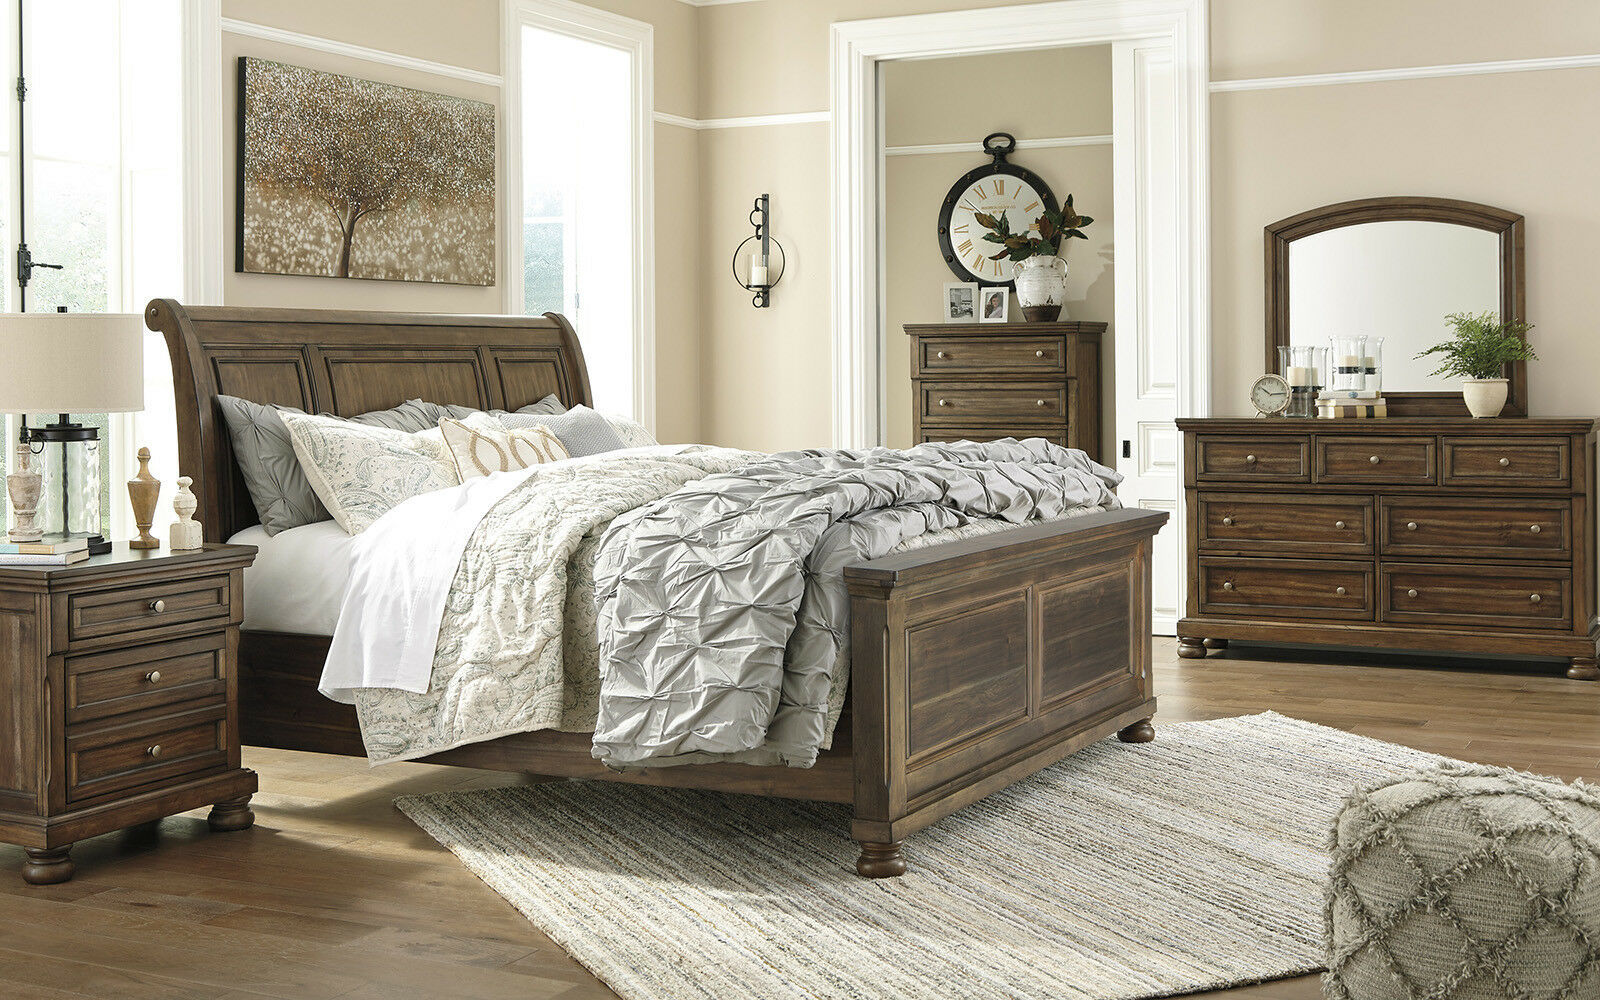 Parkside 5 piece cottage style brown solid wood bedroom - 5 piece queen sleigh bedroom set ...